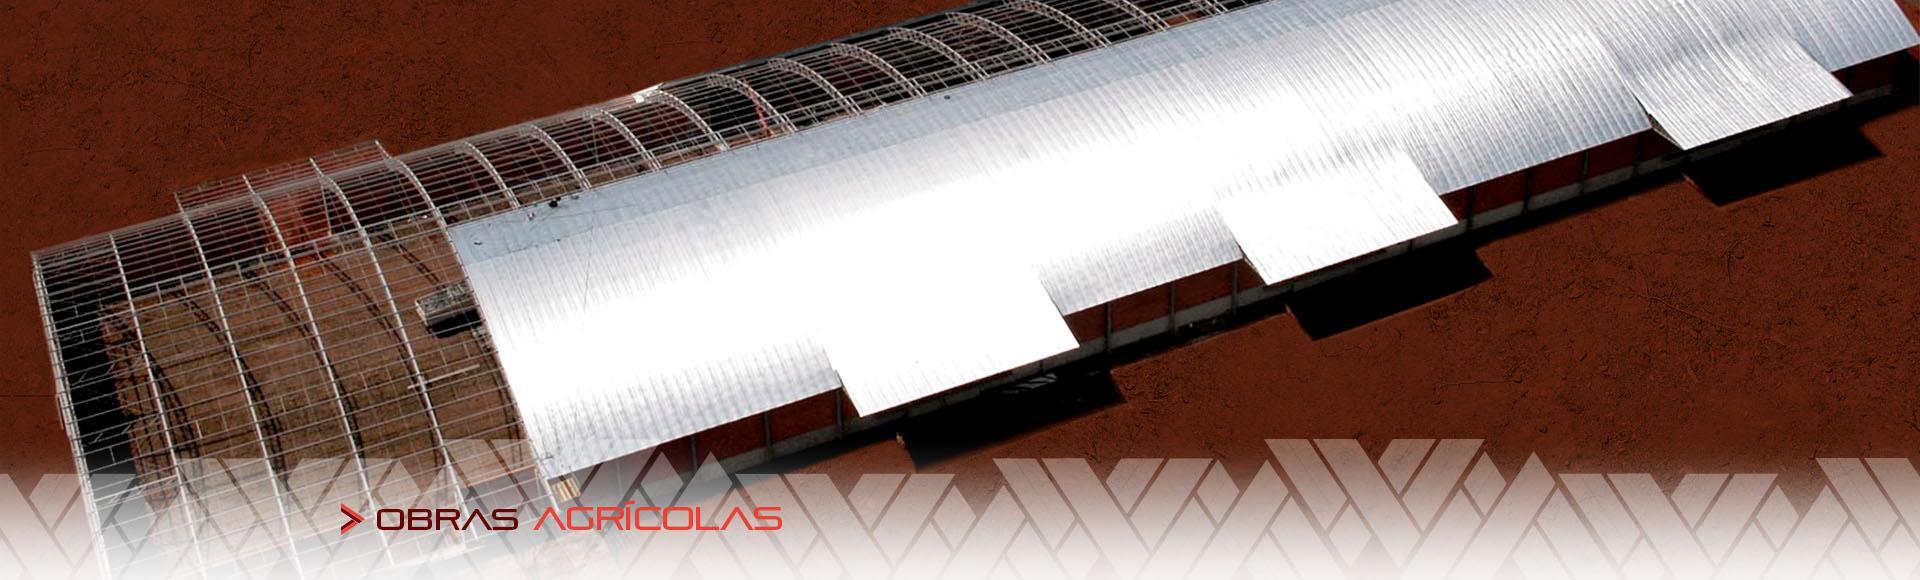 Estruturas Agrícolas - Metalsoma